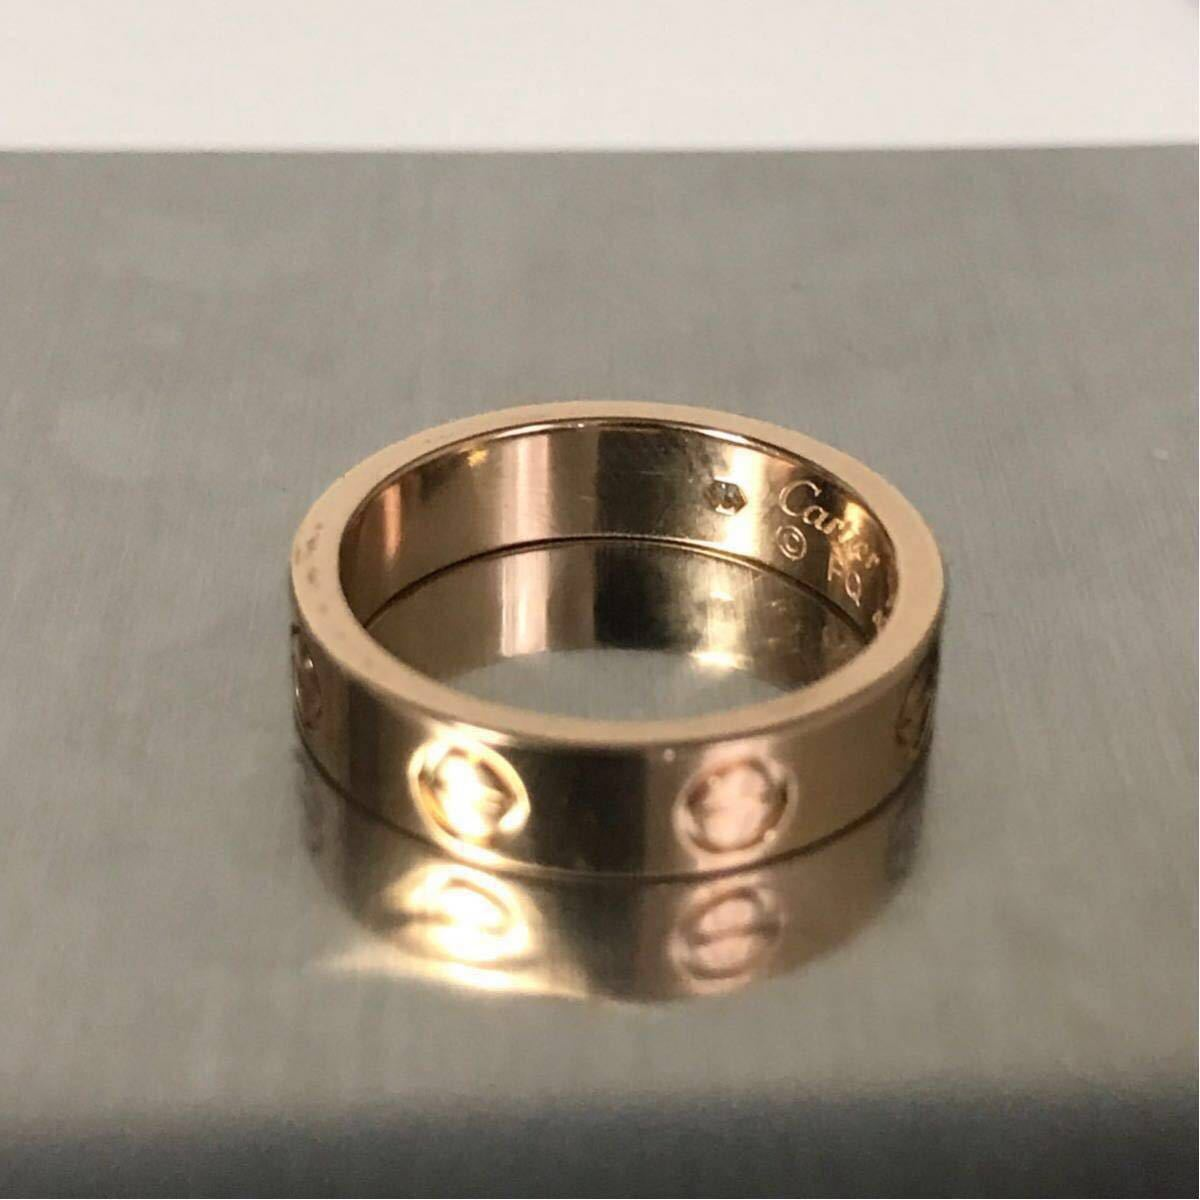 Cartier★カルティエ ラブリング★K18PG 1p ダイヤモンドリング 46 指輪 ウエディング ピンクゴールド_画像4